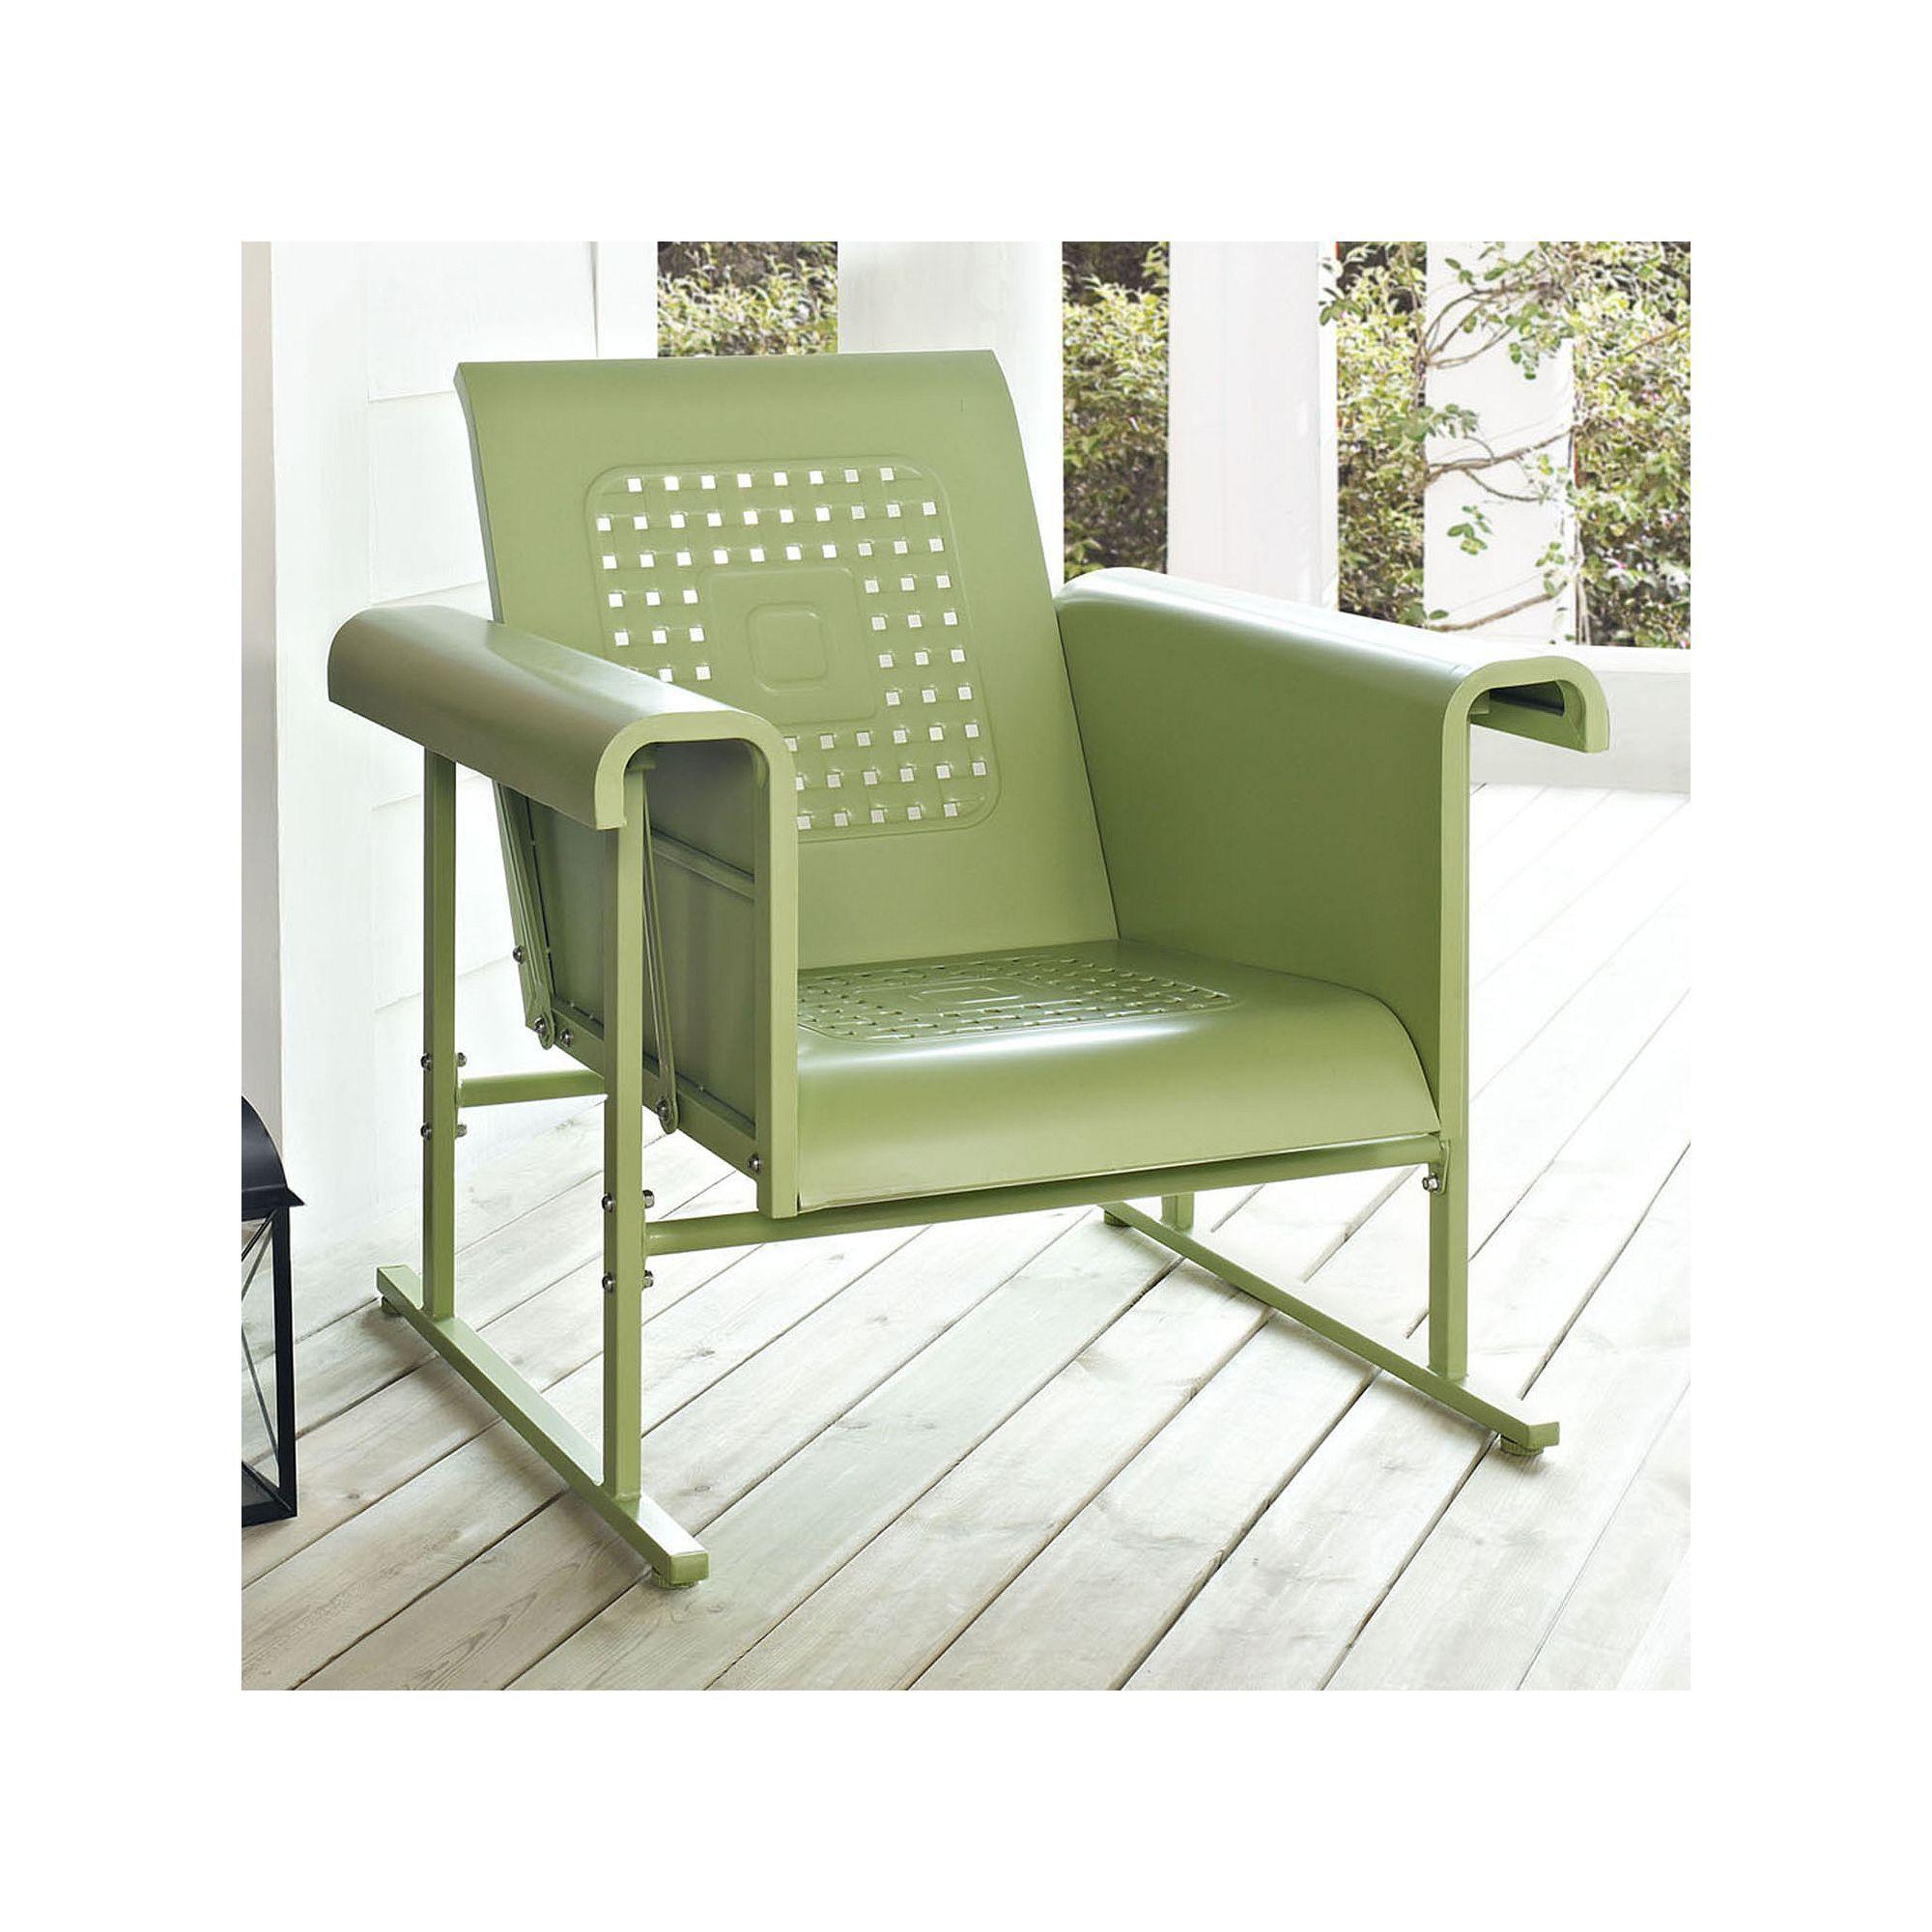 Crosley Outdoor Veranda Single Glider Chair, Green